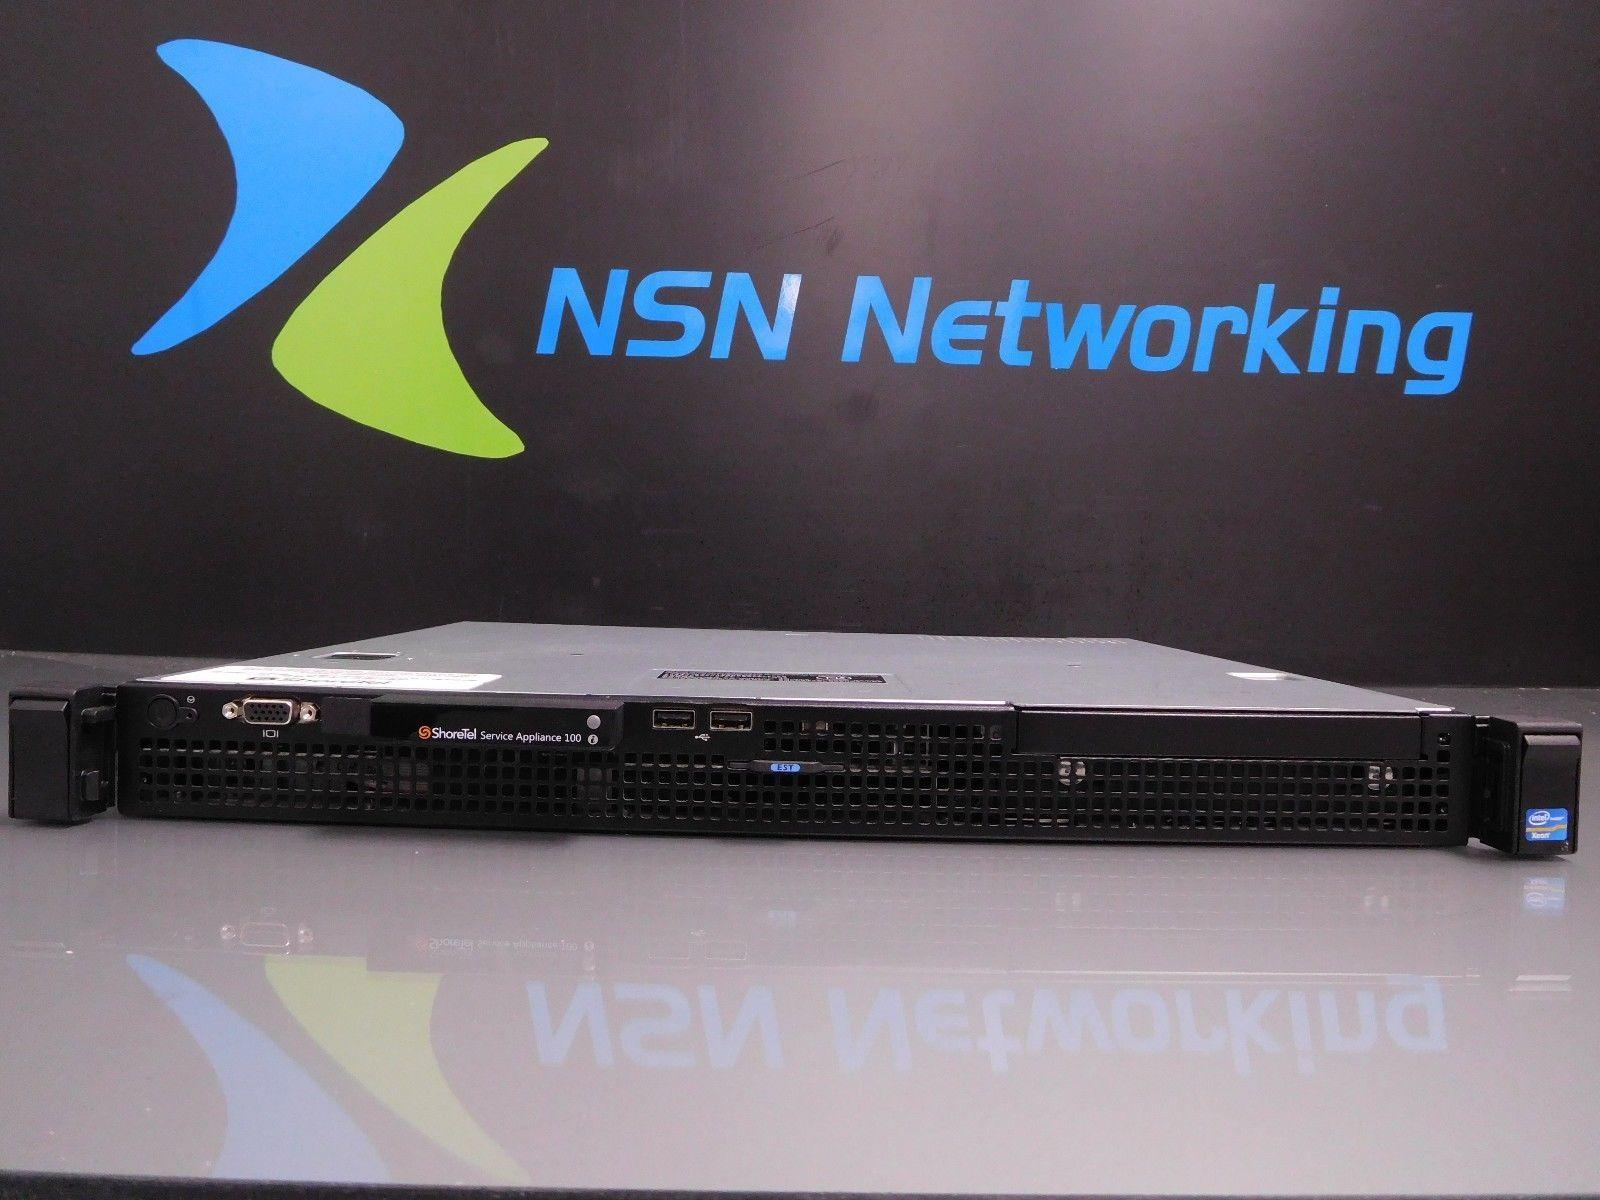 ShoreTel Server Appliance 100 Dell E10S 77FRW Server NO RAIL KITS INCLUDED image 2